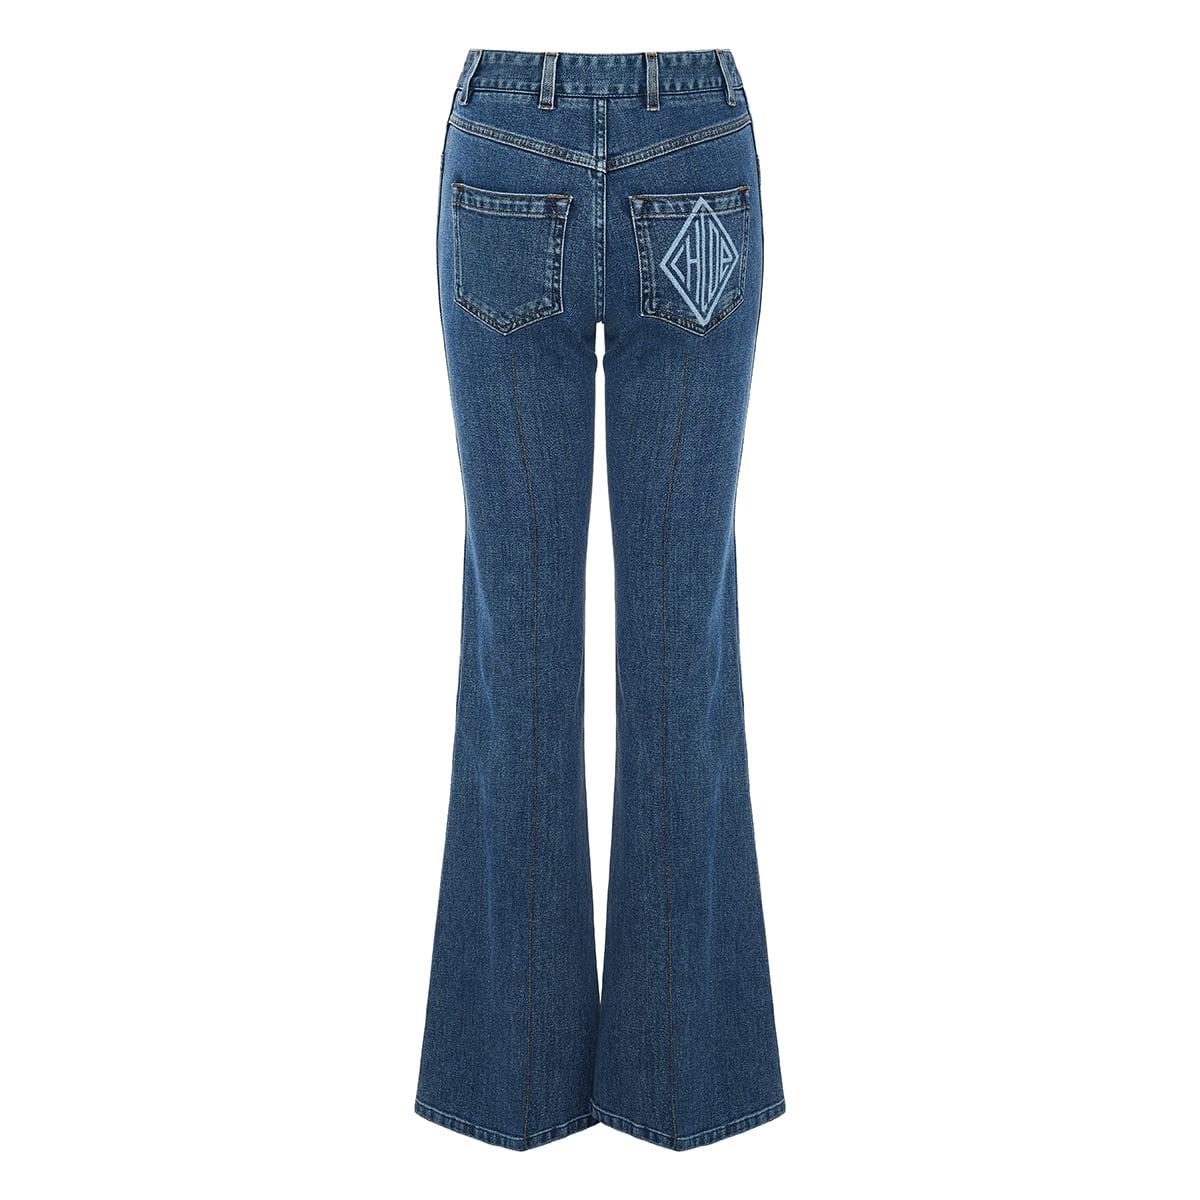 High-waist flared jeans